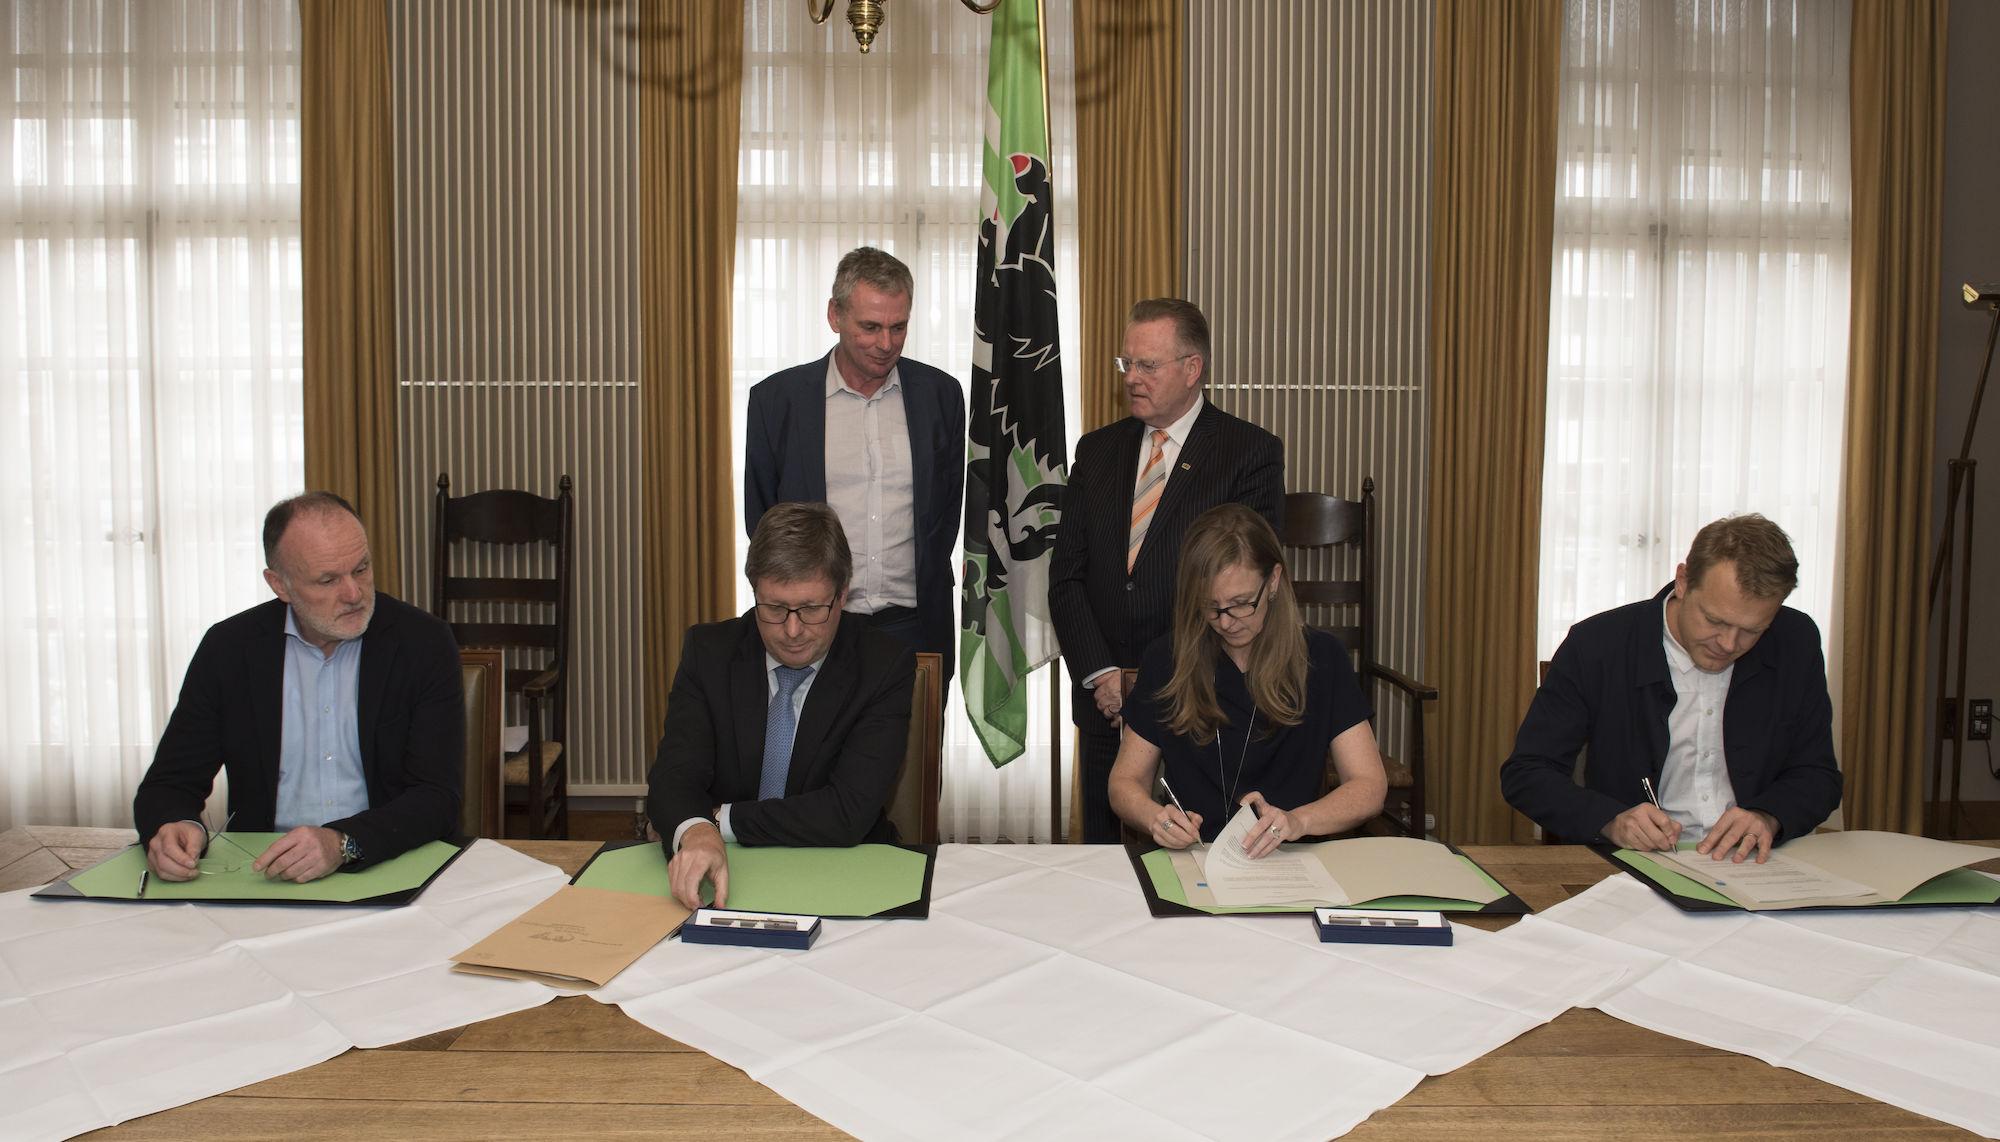 180309-ondertekening-overeenkomst-realisatie-Leopoldskazerne-00002.jpg